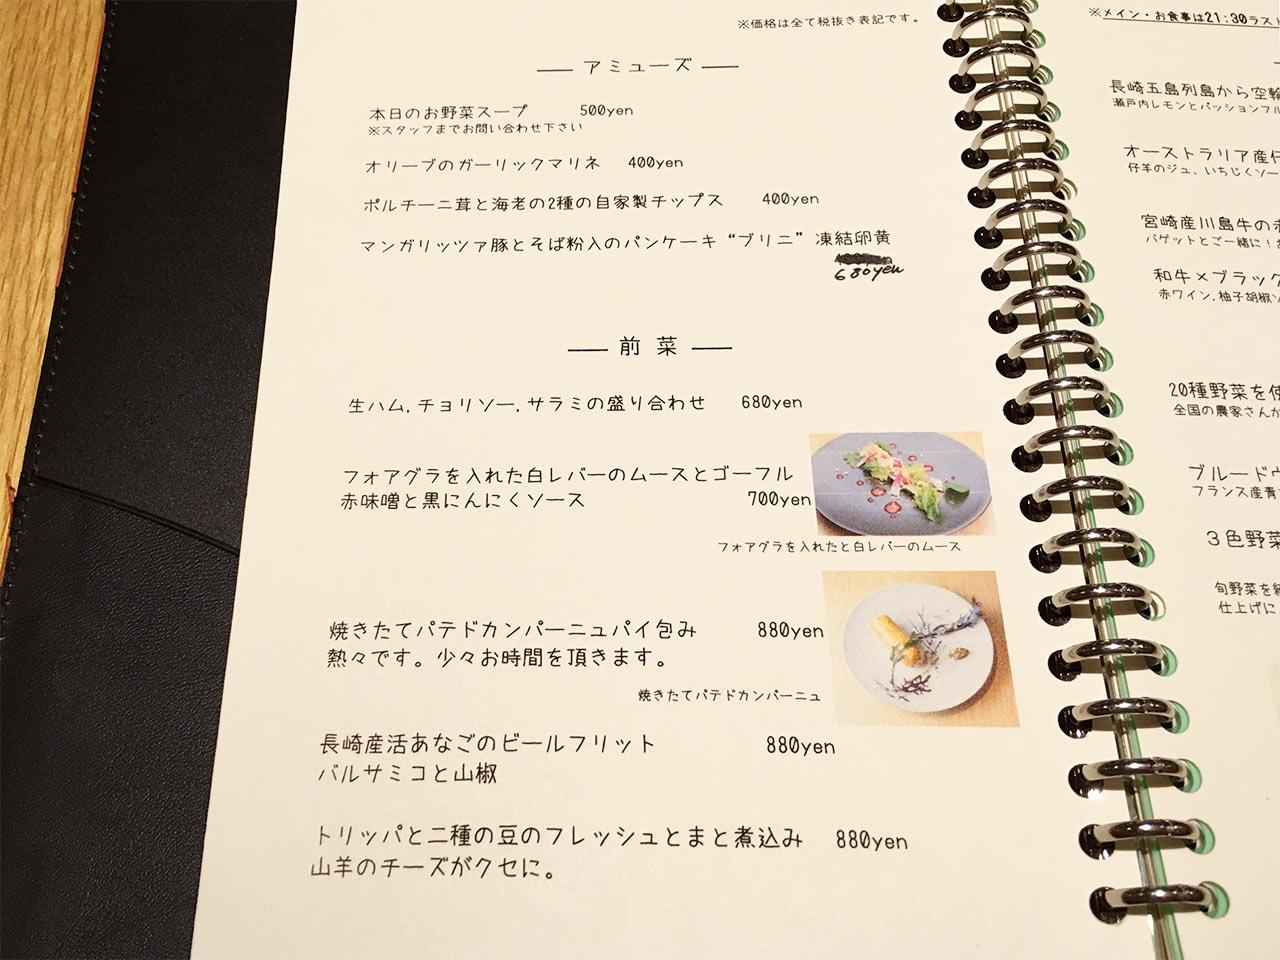 musashikoyama-ferme-201607-menu01